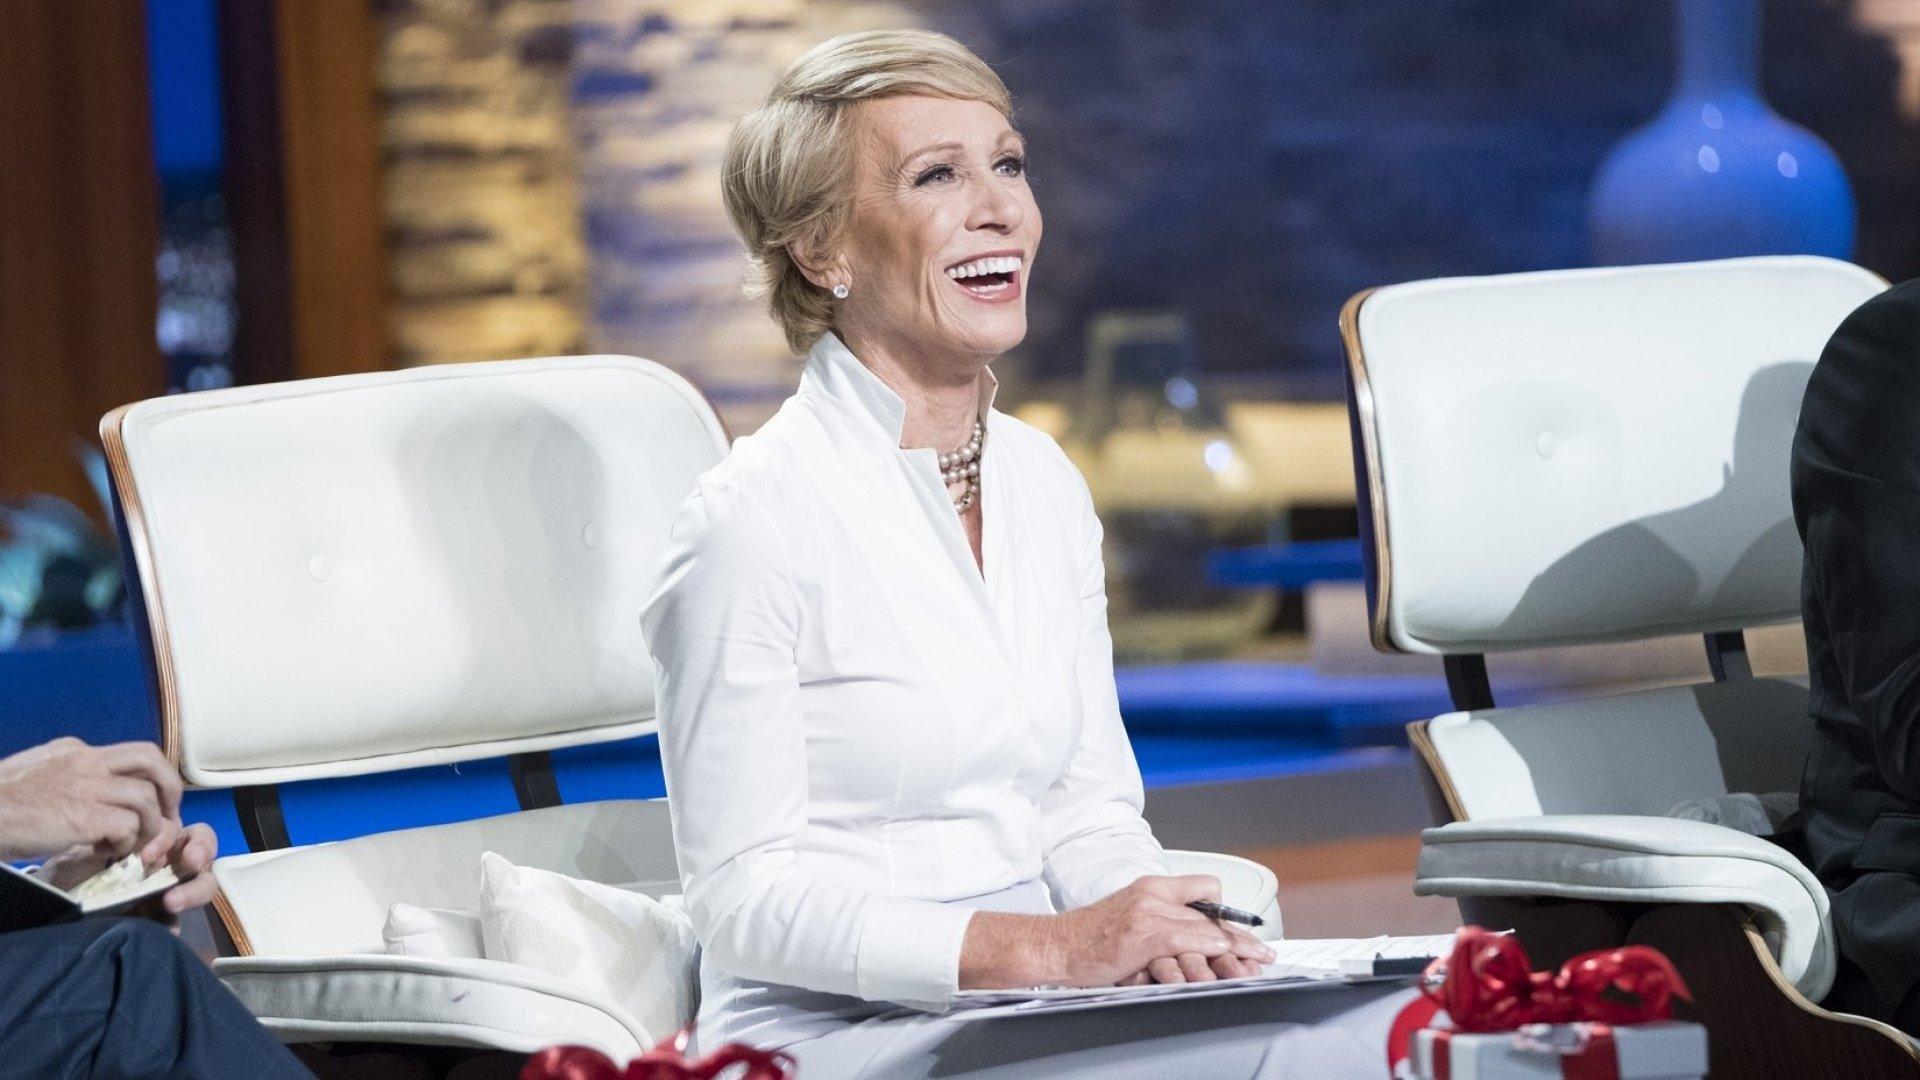 'Shark Tank' investor Barbara Corcoran